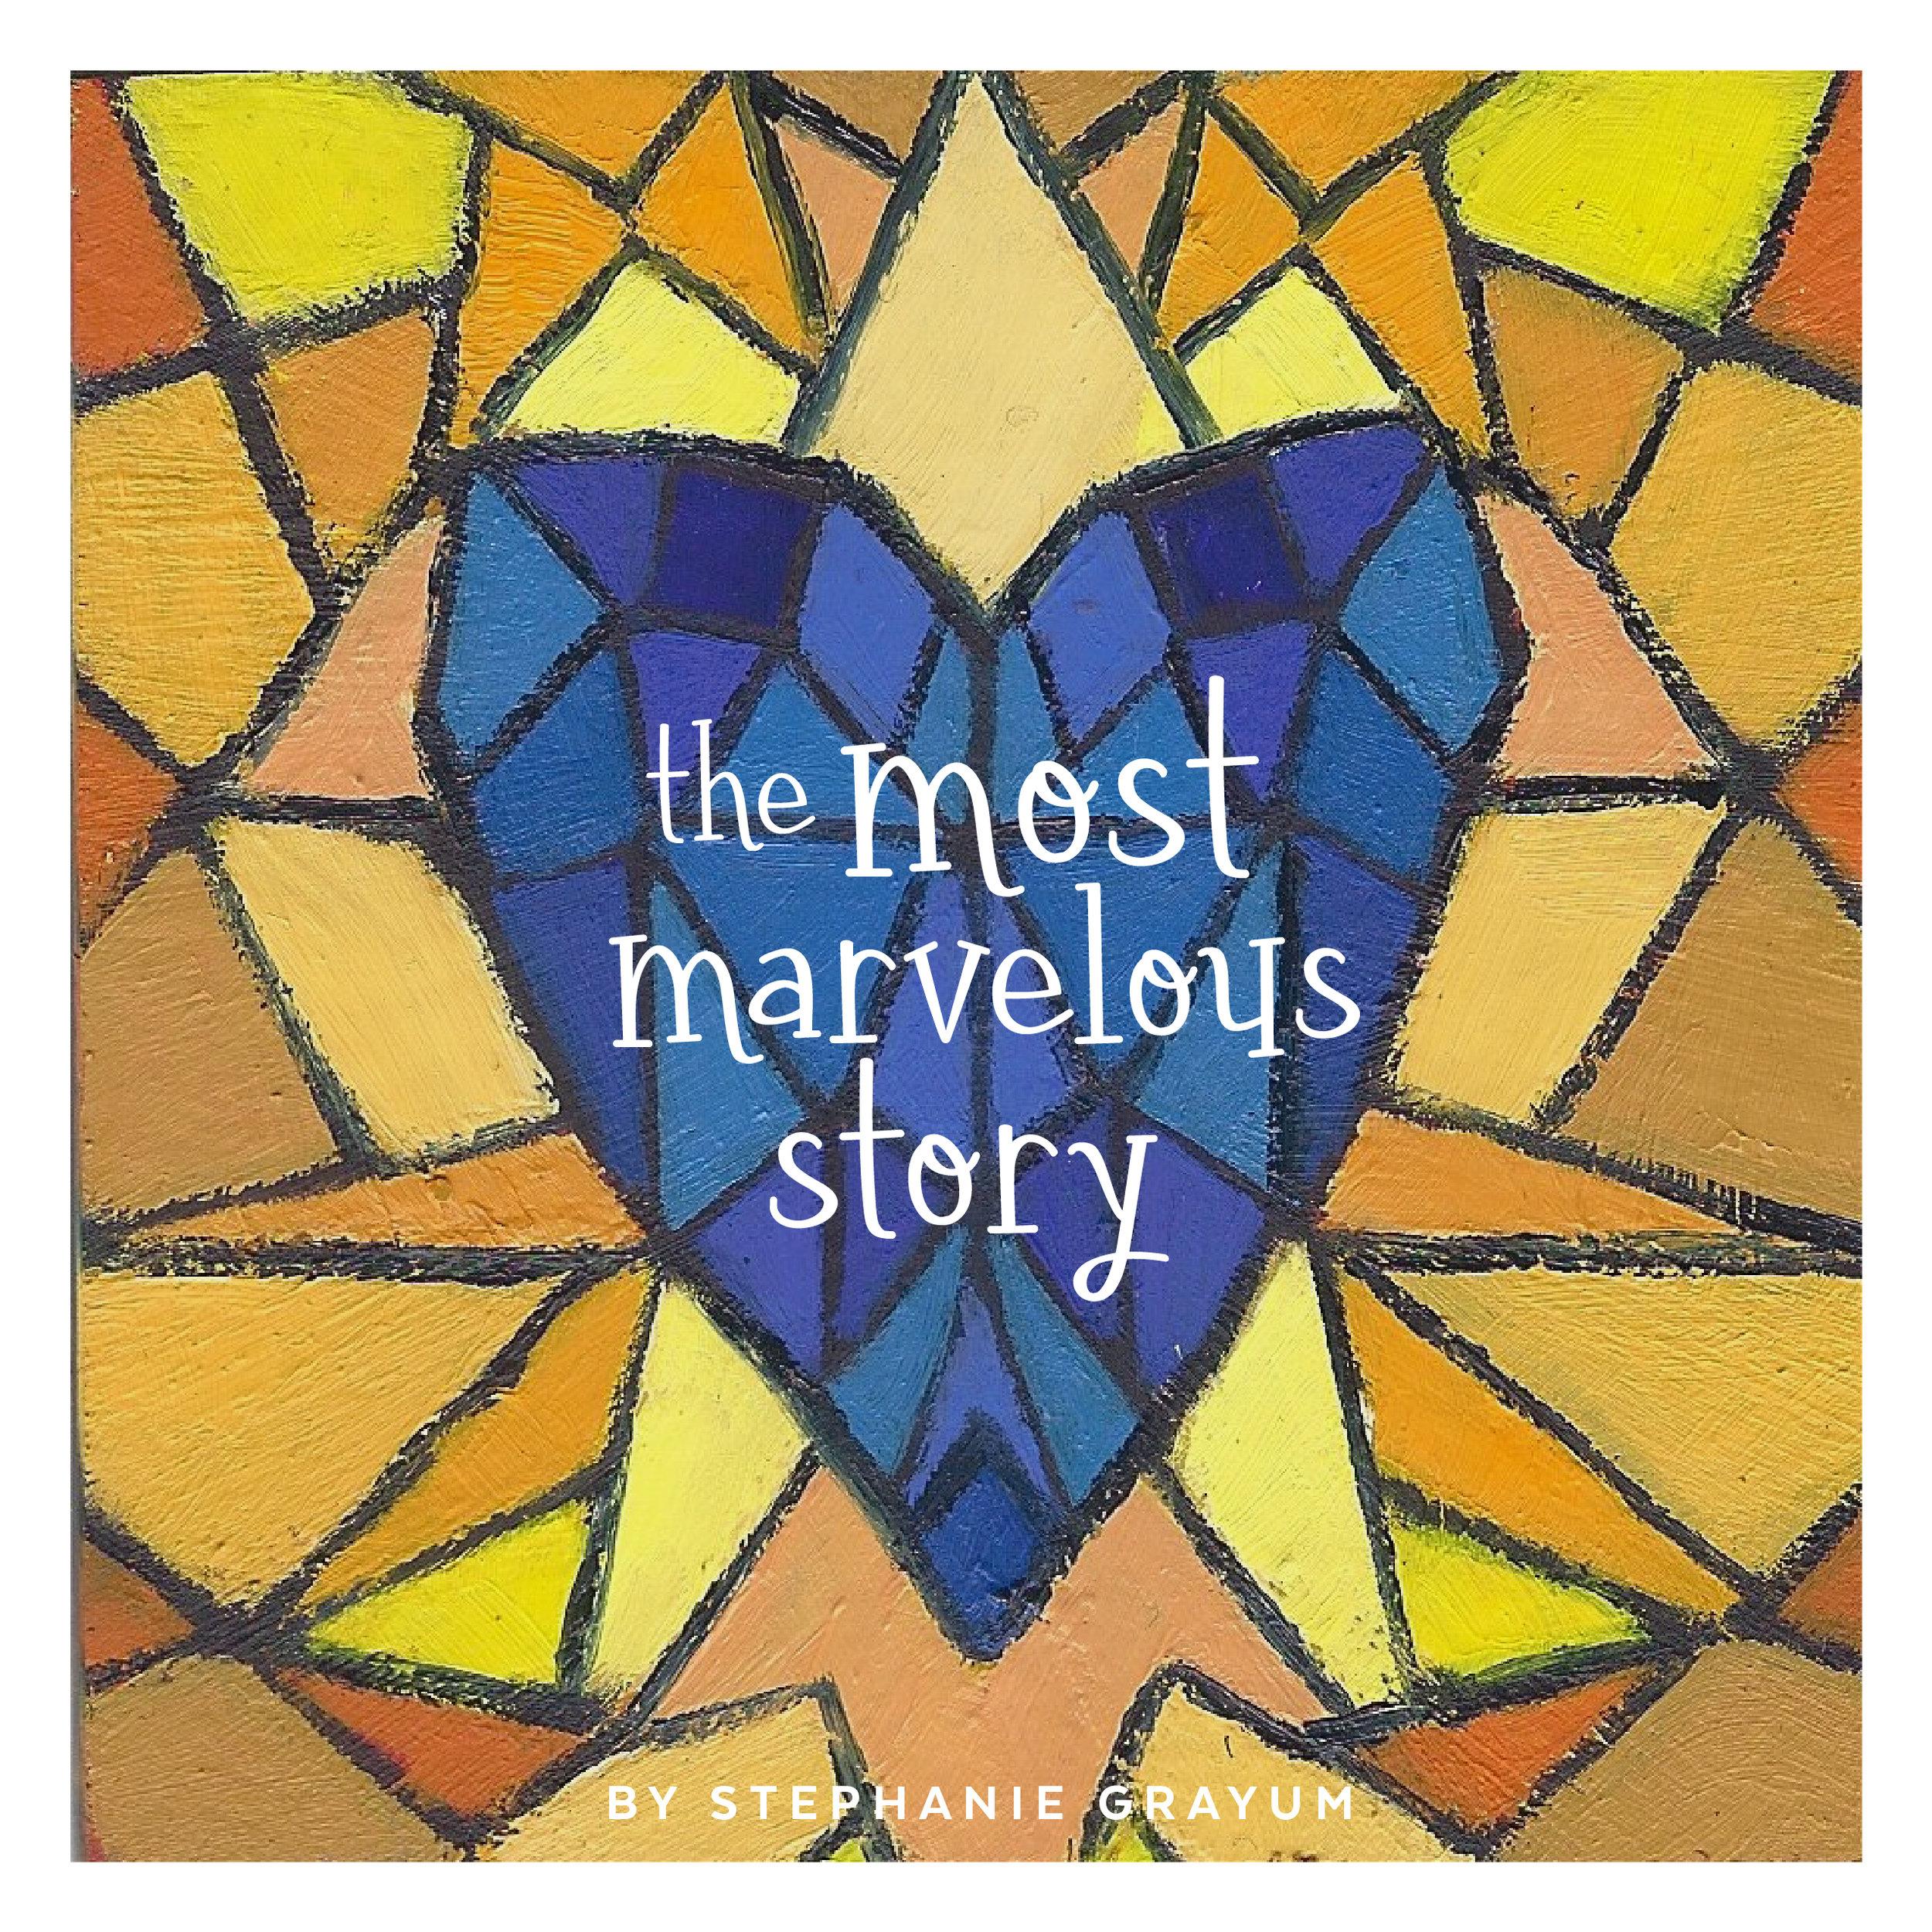 Marvelous Story Title Image.jpg